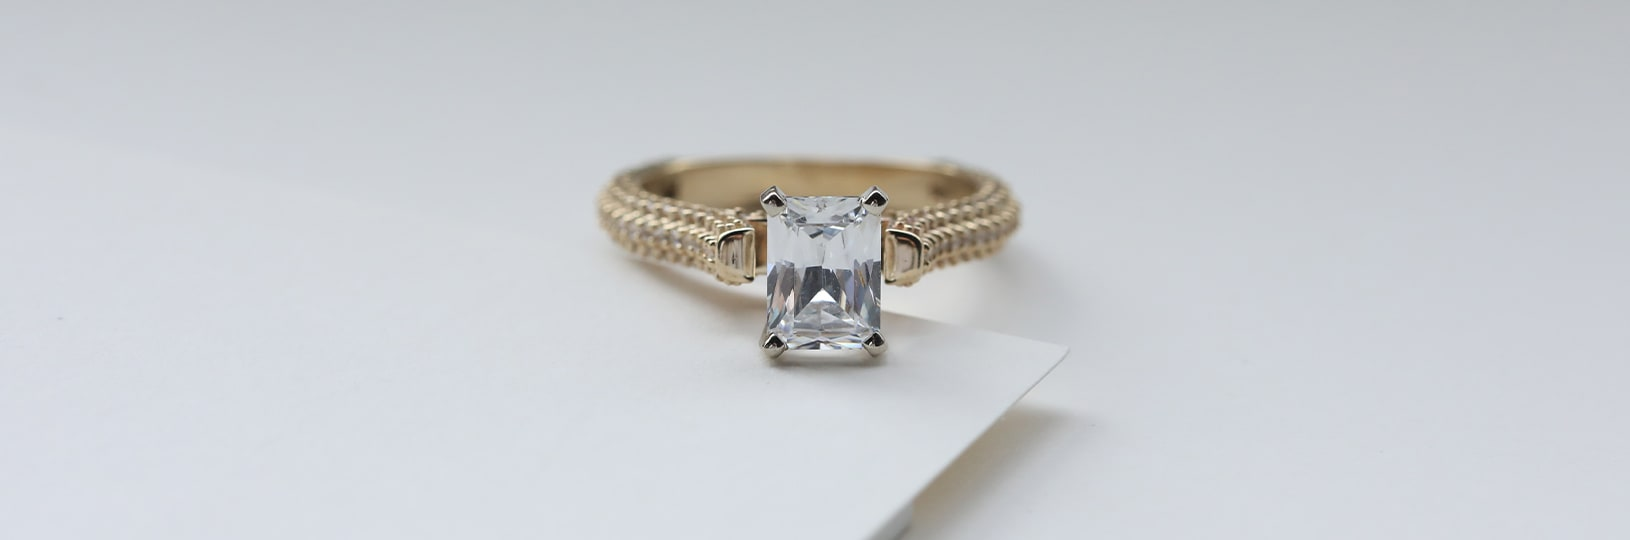 Radiant cut pavé engagement ring